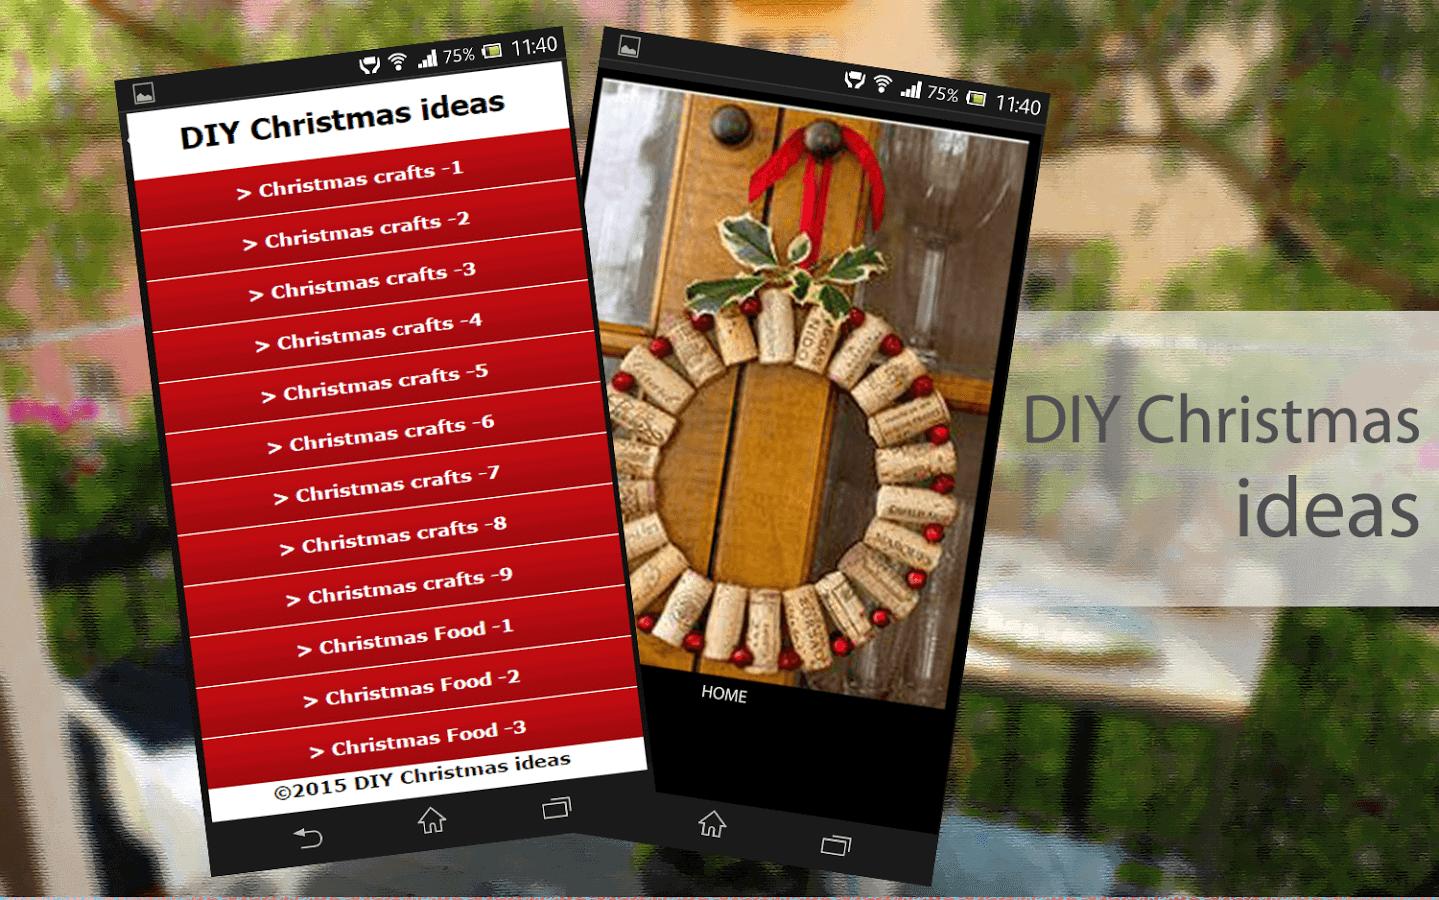 diy-christmas-ideas-top-10